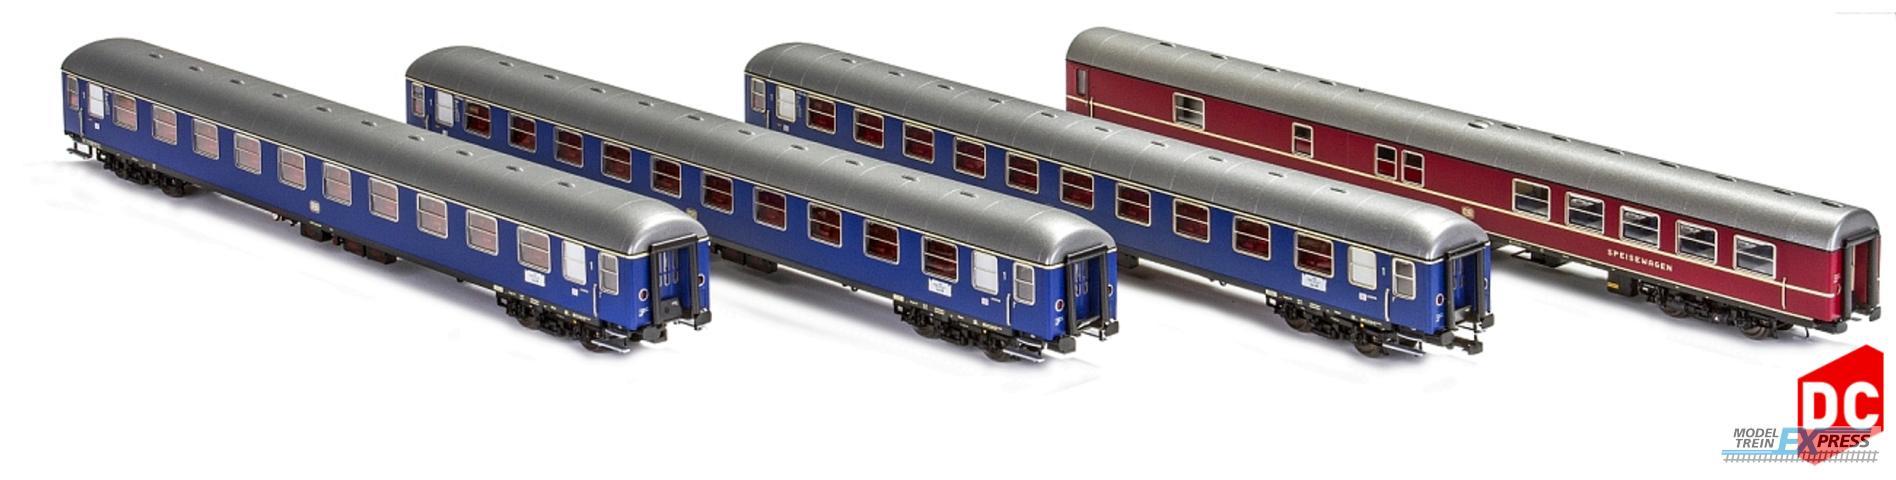 Hobbytrain 43021